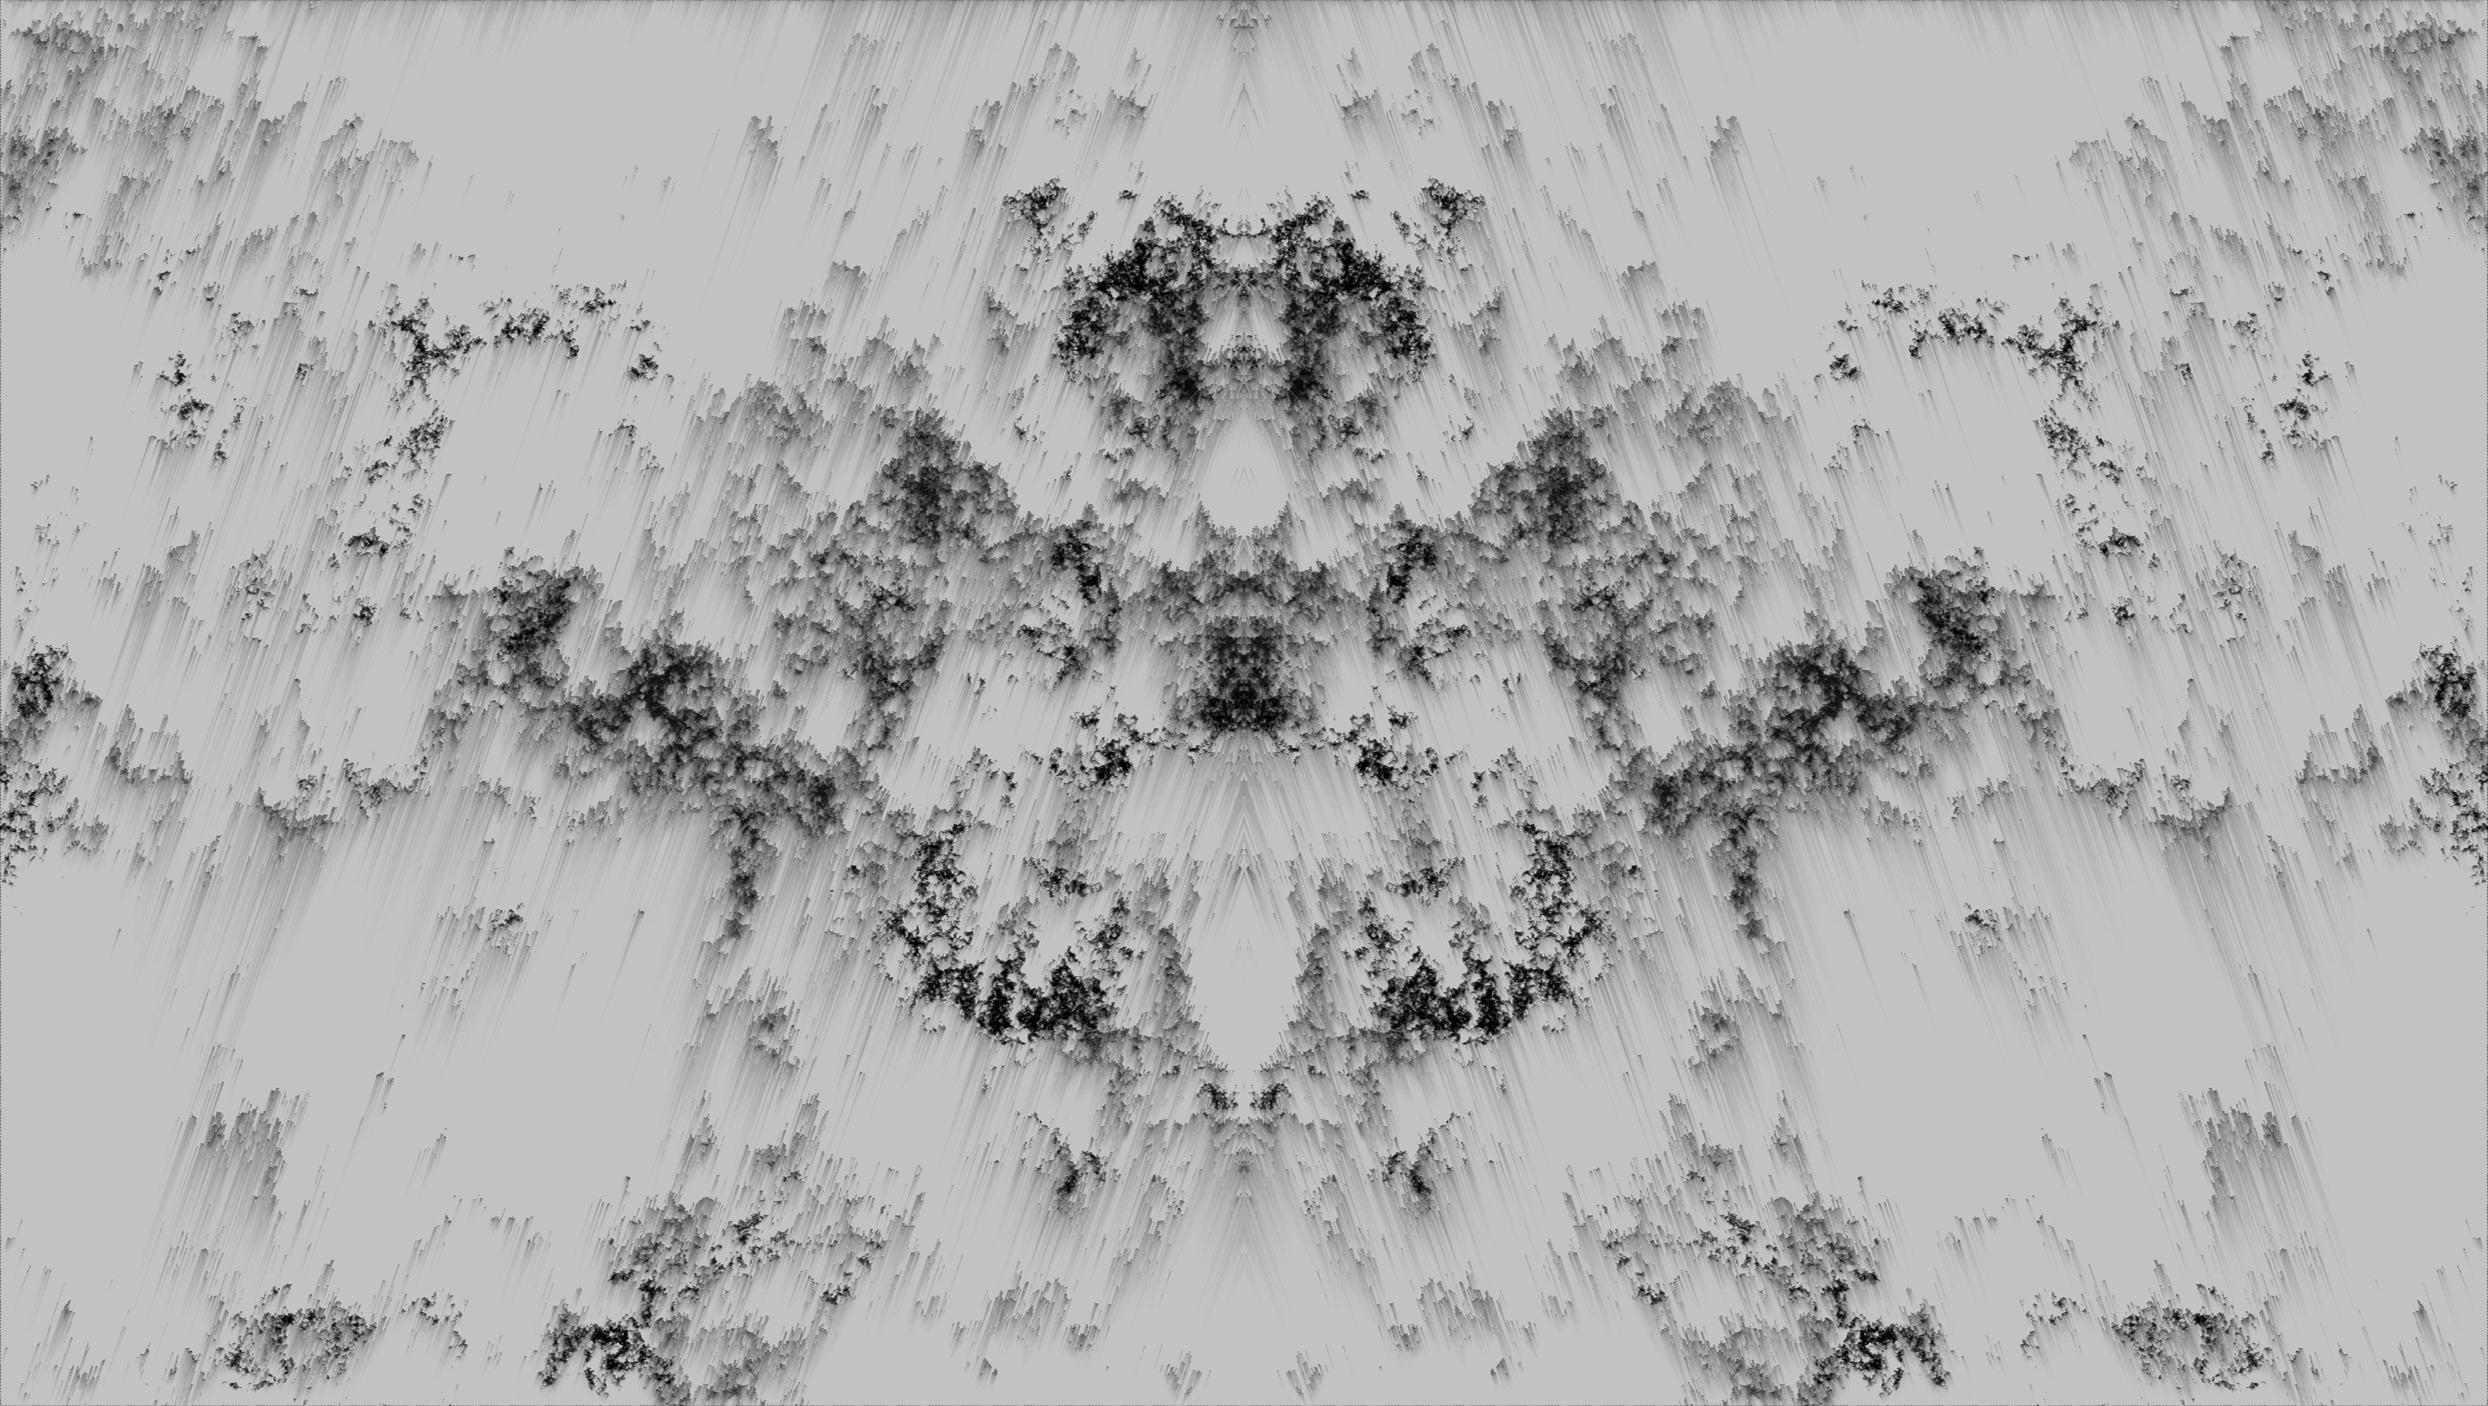 digital, pixelsort, glitch, glitchart - thundr | ello